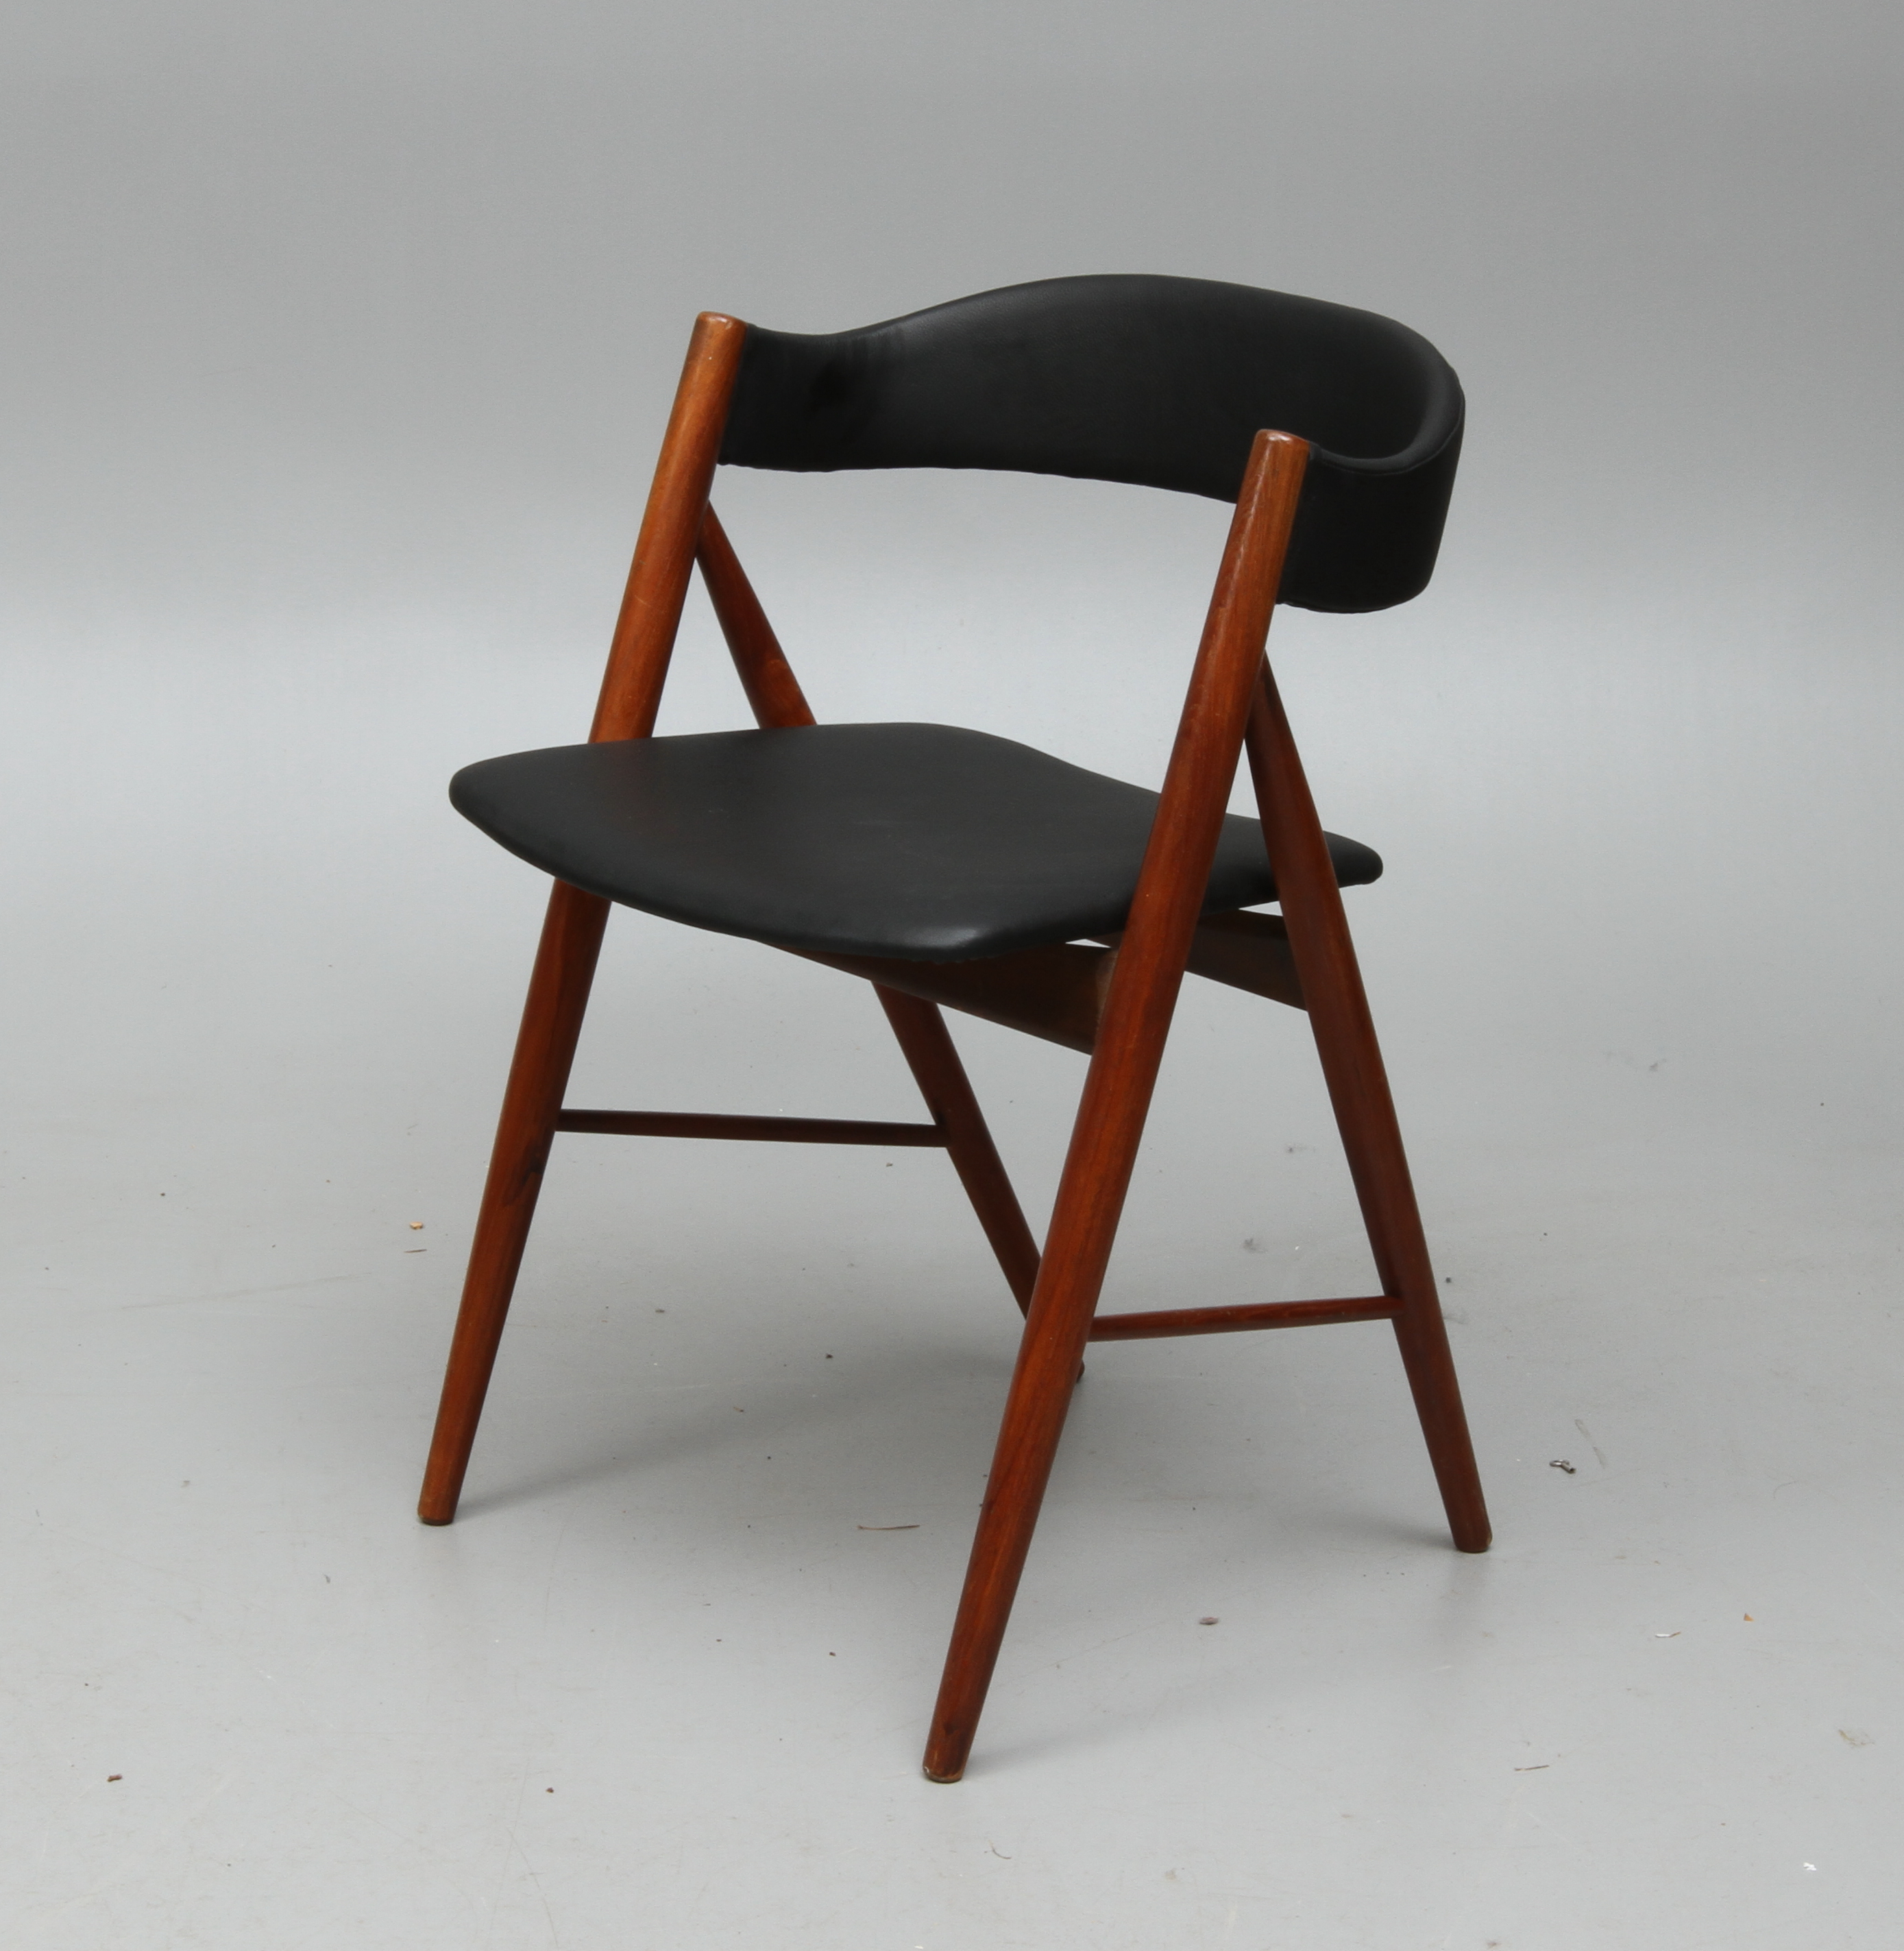 stol teak STOL, teak, 1950/60 tal. Furniture   Armchairs & Chairs   Auctionet stol teak